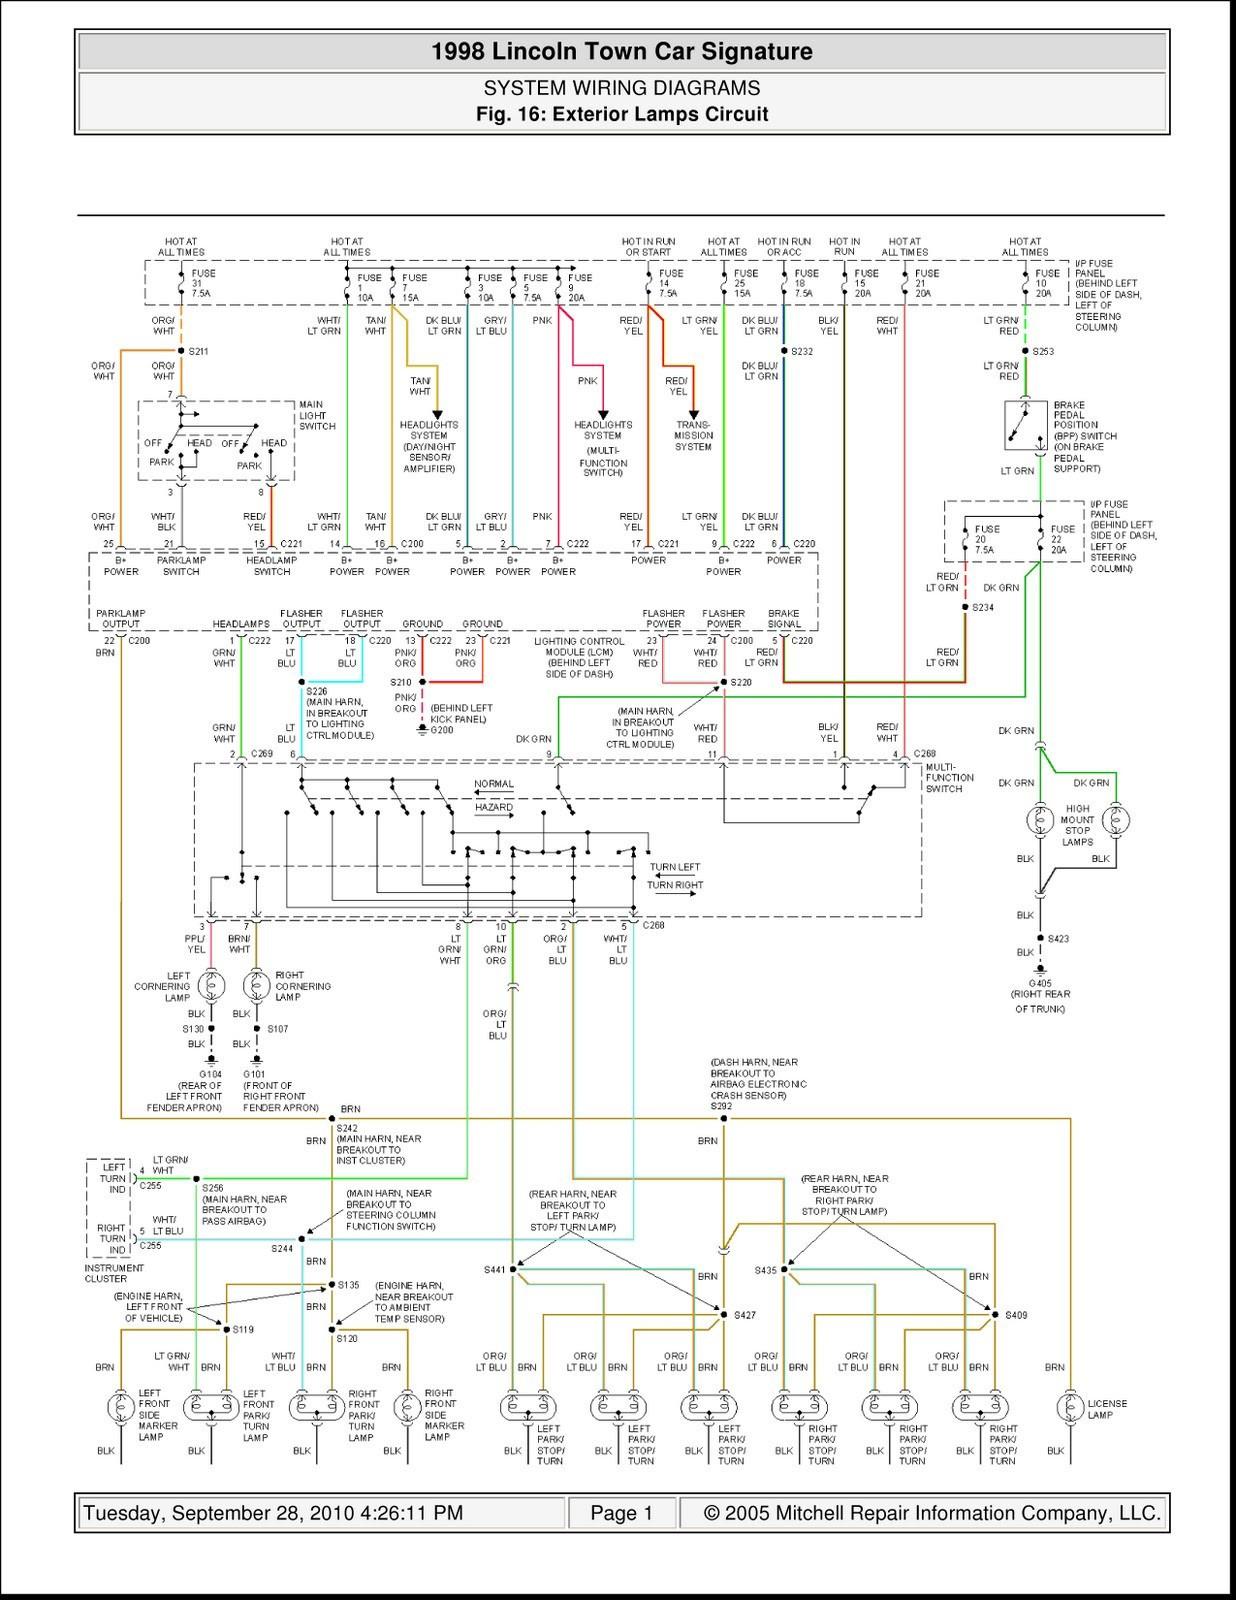 2000 Lincoln town Car Wiring Diagram 1998 Lincoln town Car Wiring Diagrams Worksheet and Wiring Diagram •